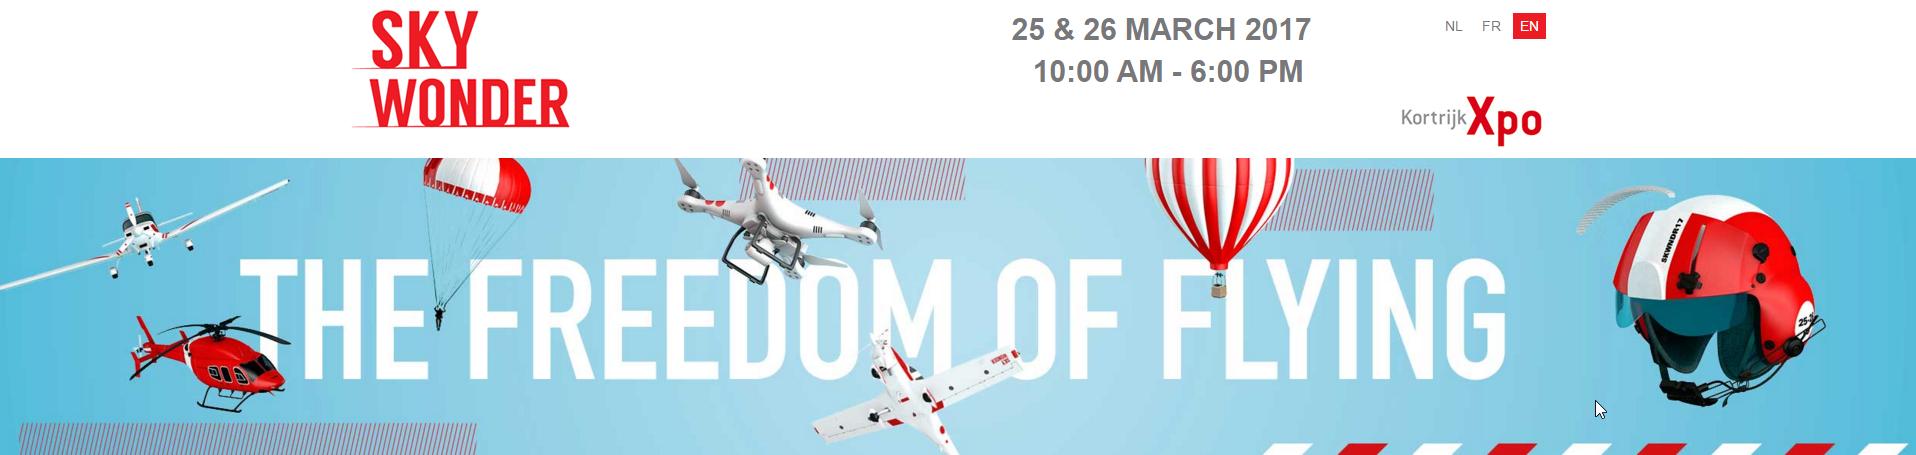 Skywonder 2017, Kortrijk Expo